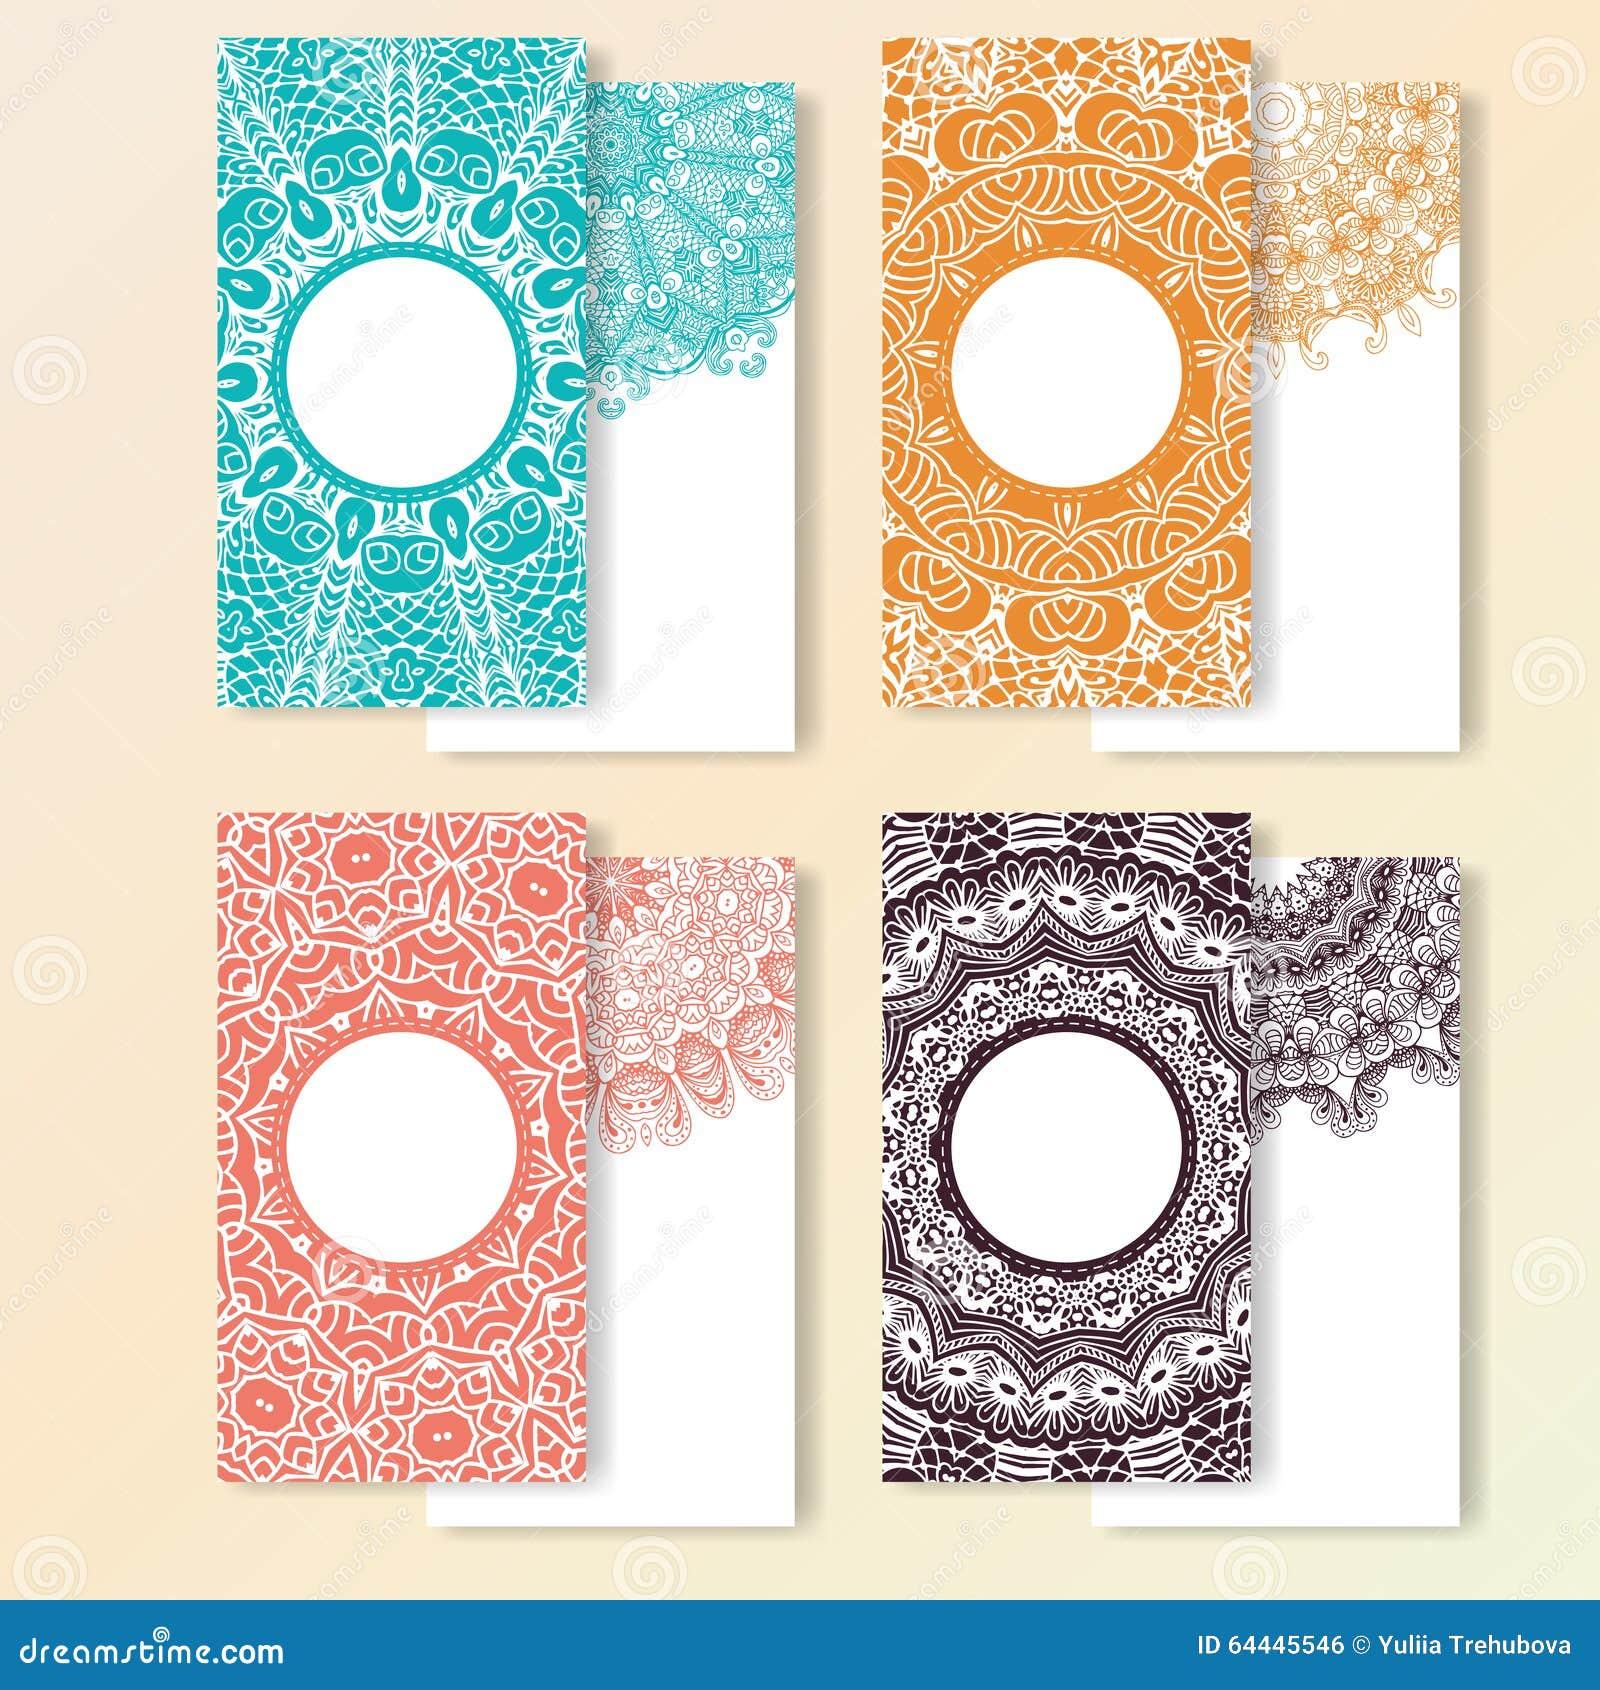 how to draw a mandala greeting card